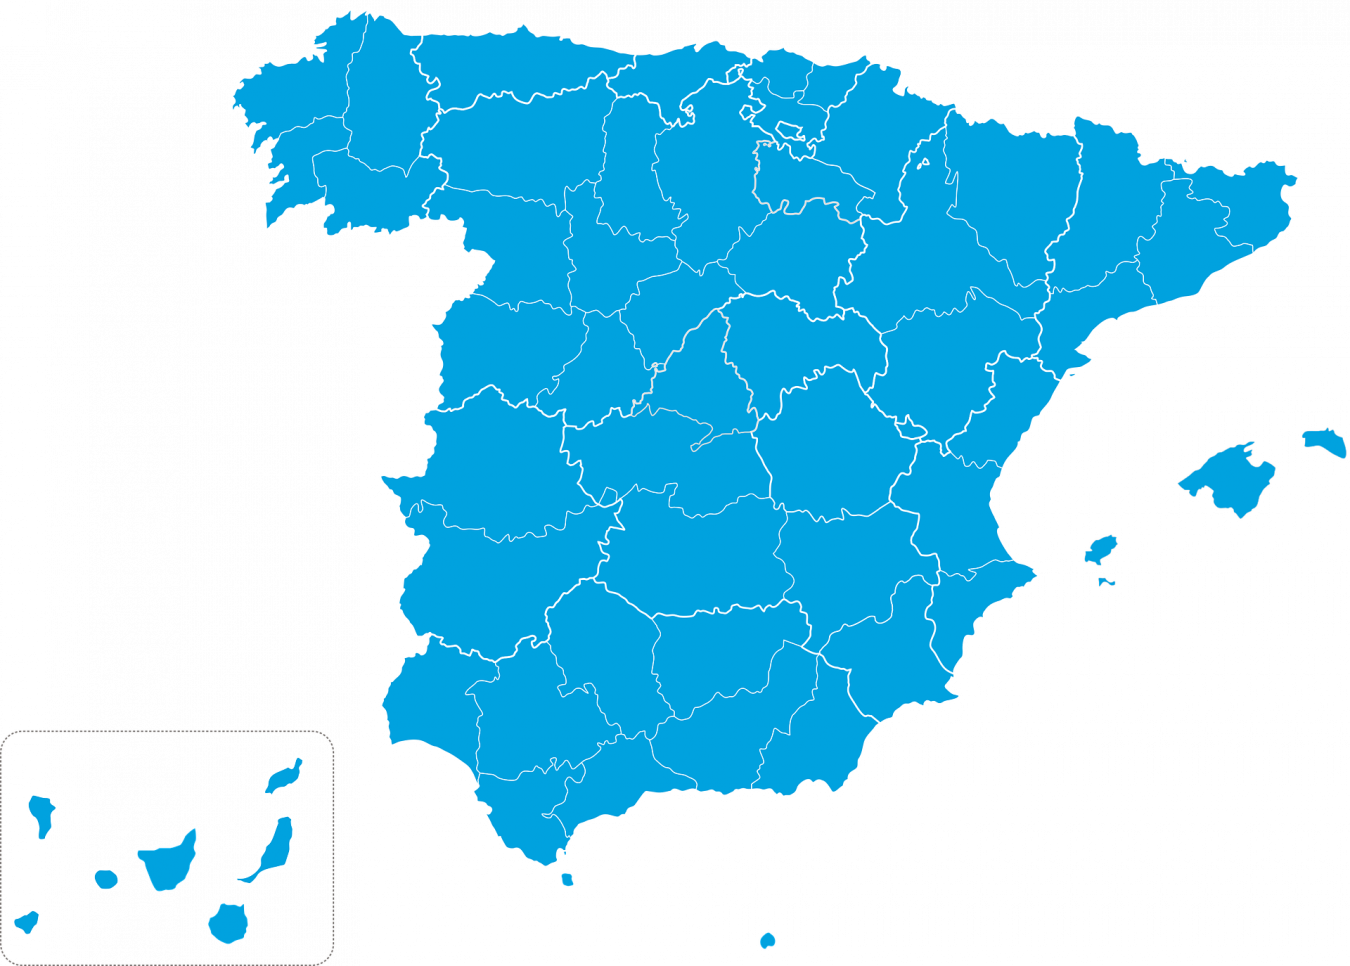 Factura de agua según la Comunidad Autónoma